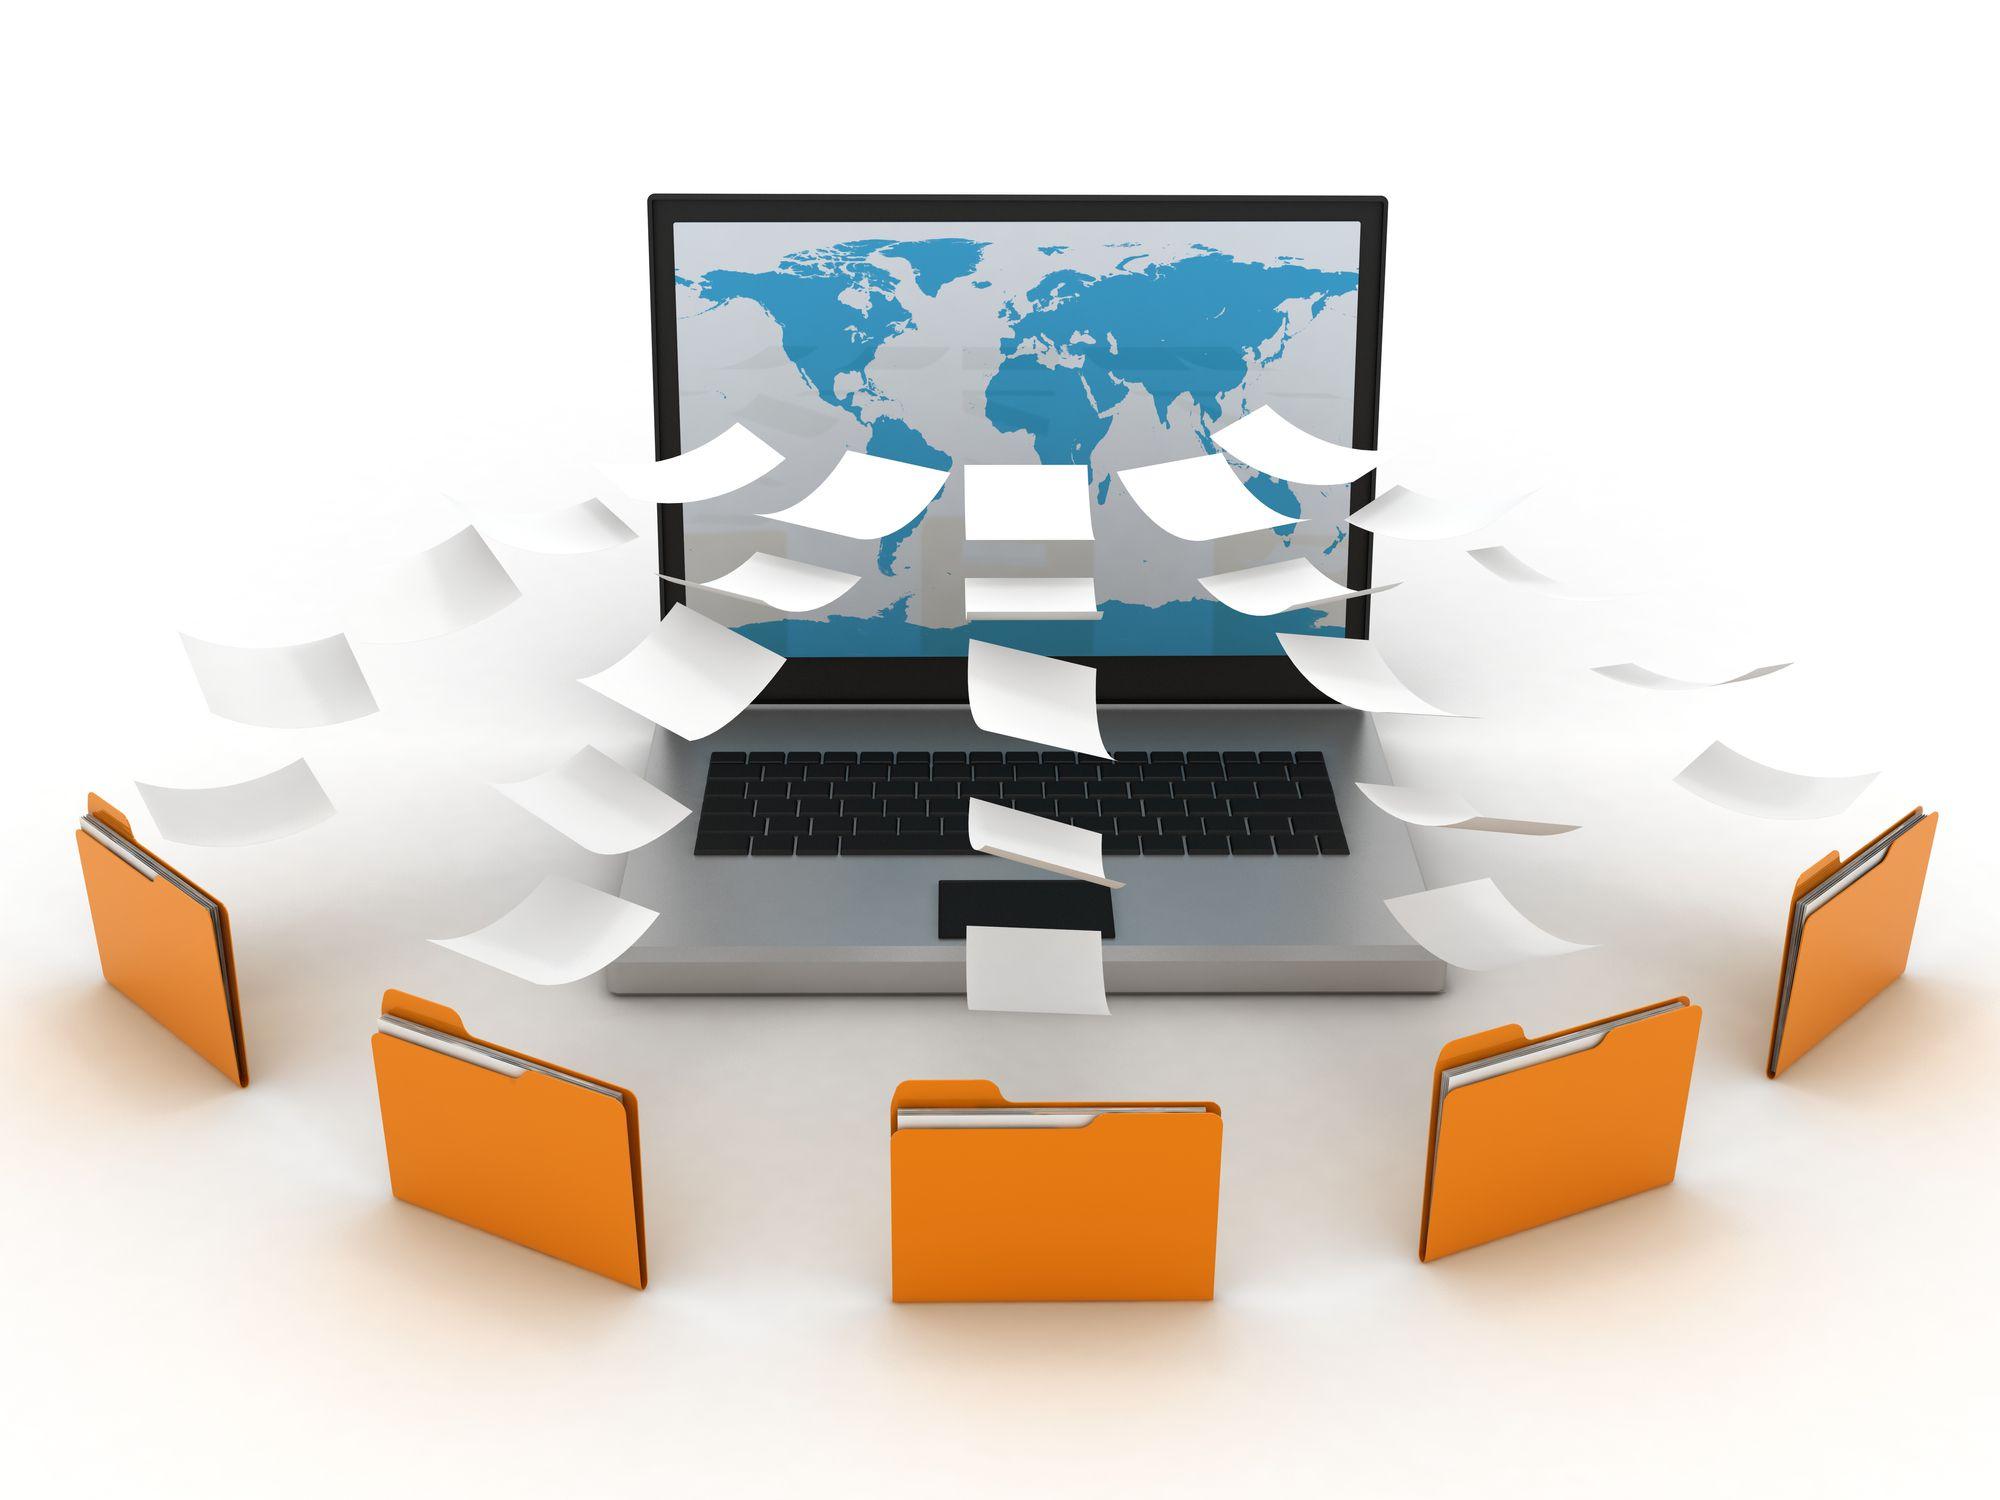 Outlook email folder system on computer